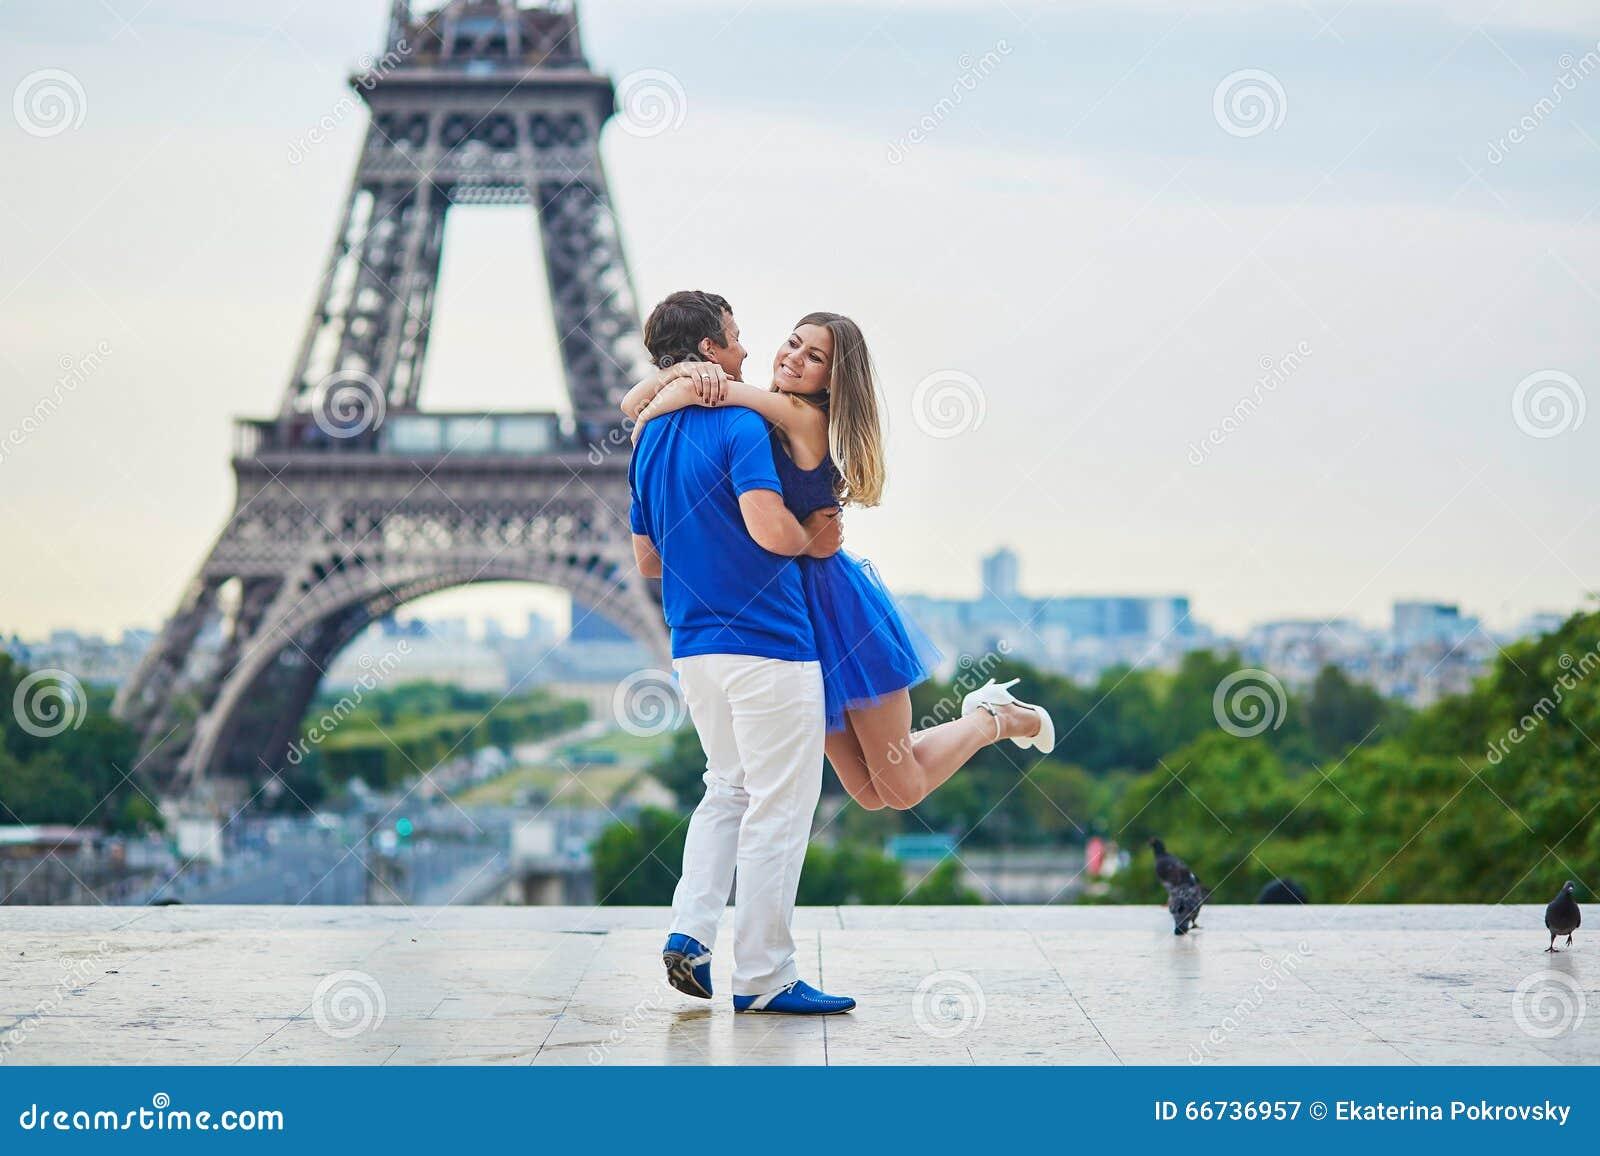 Rich man dating site tournai rus lesbian muie natura paris chat contacte barcelona san blas